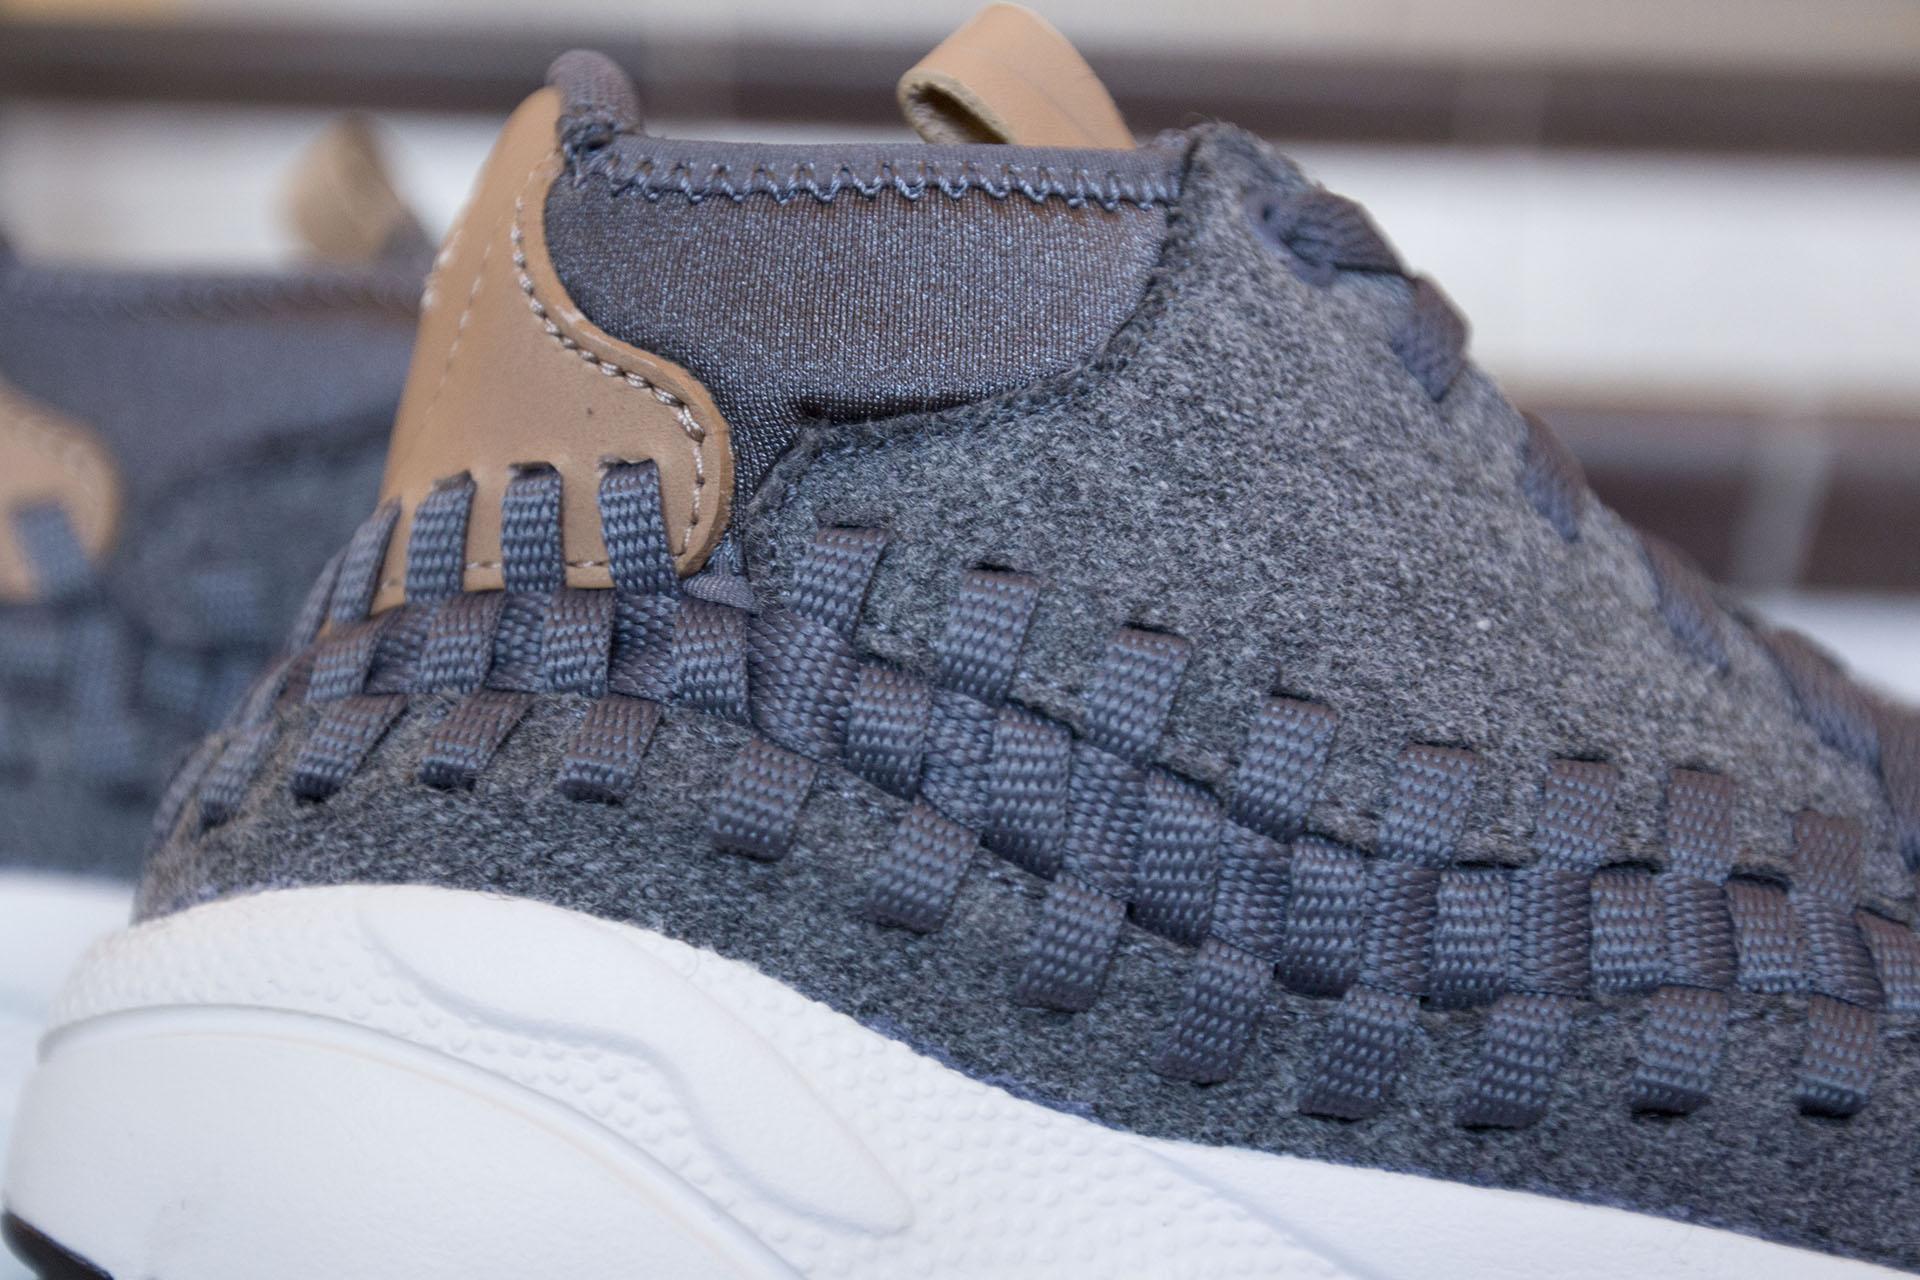 on sale deb30 35db3 ... Купить мужские серые кроссовки Nike Air Footscape Woven Chukka SE - фото  7 картинки